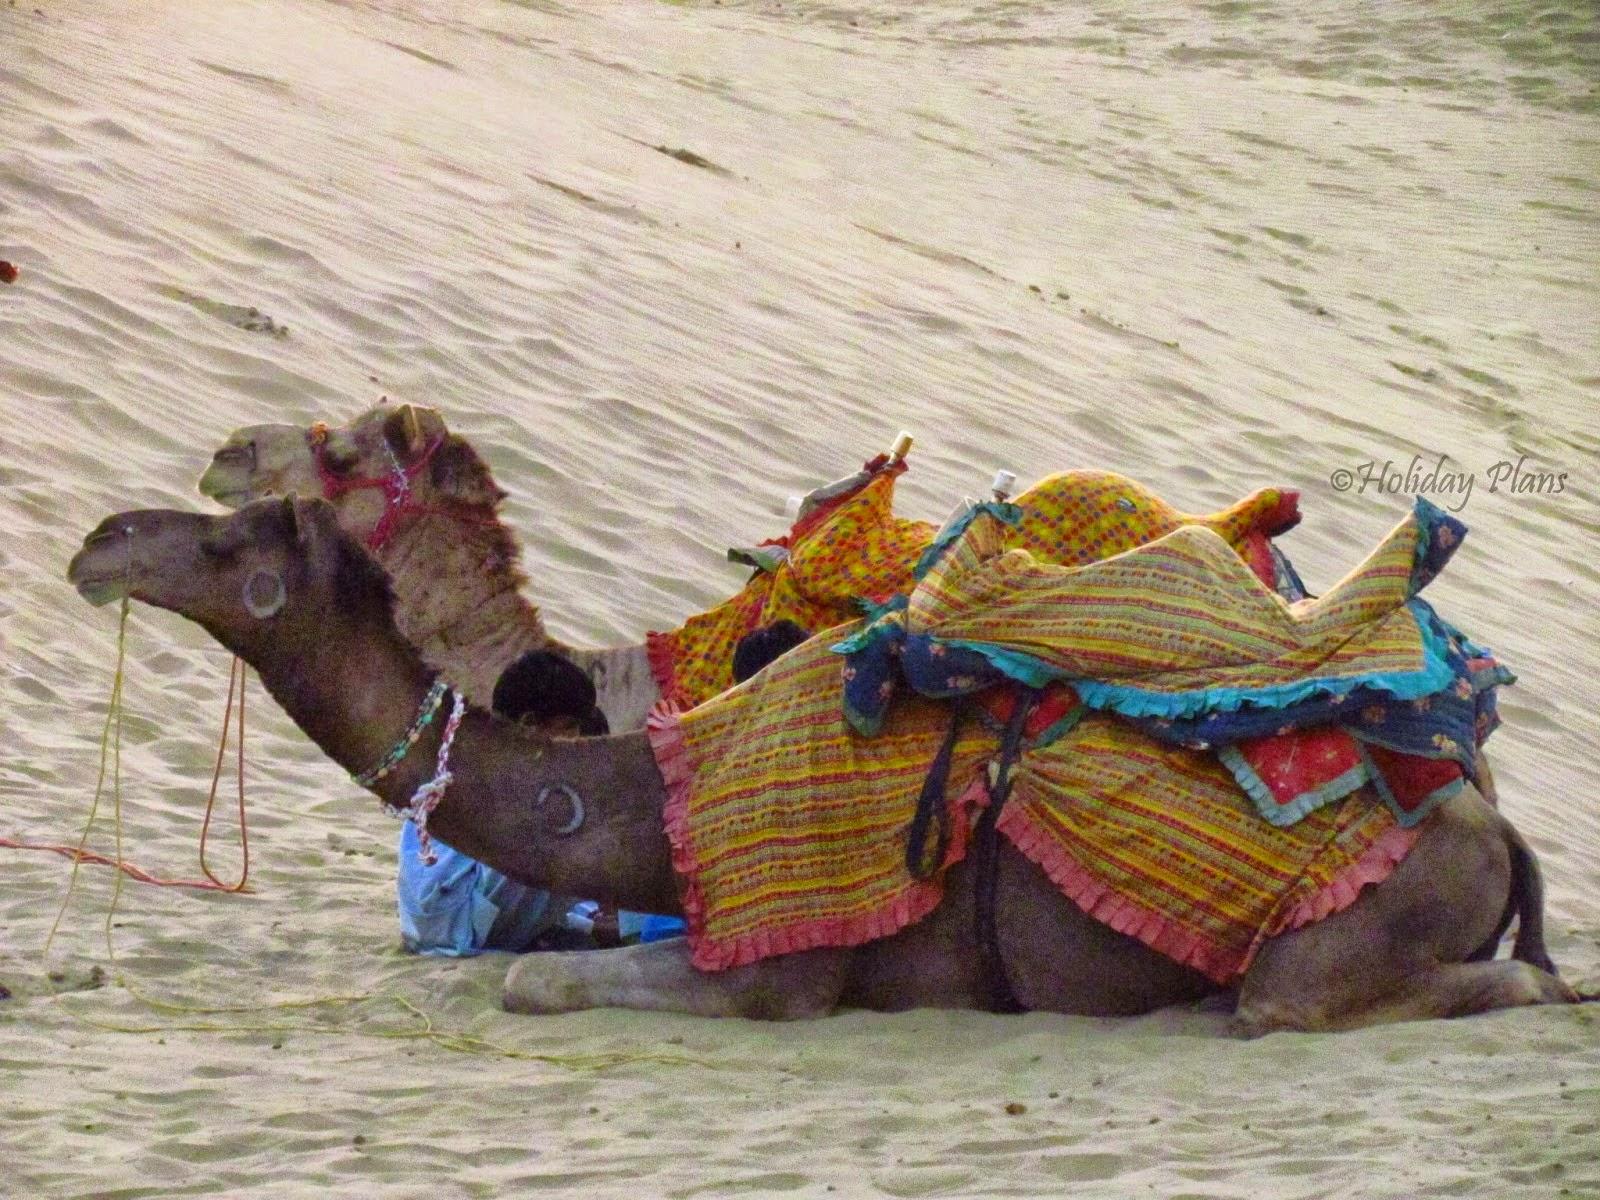 camels at Thar Desert in Jaisalmer, Rajasthan